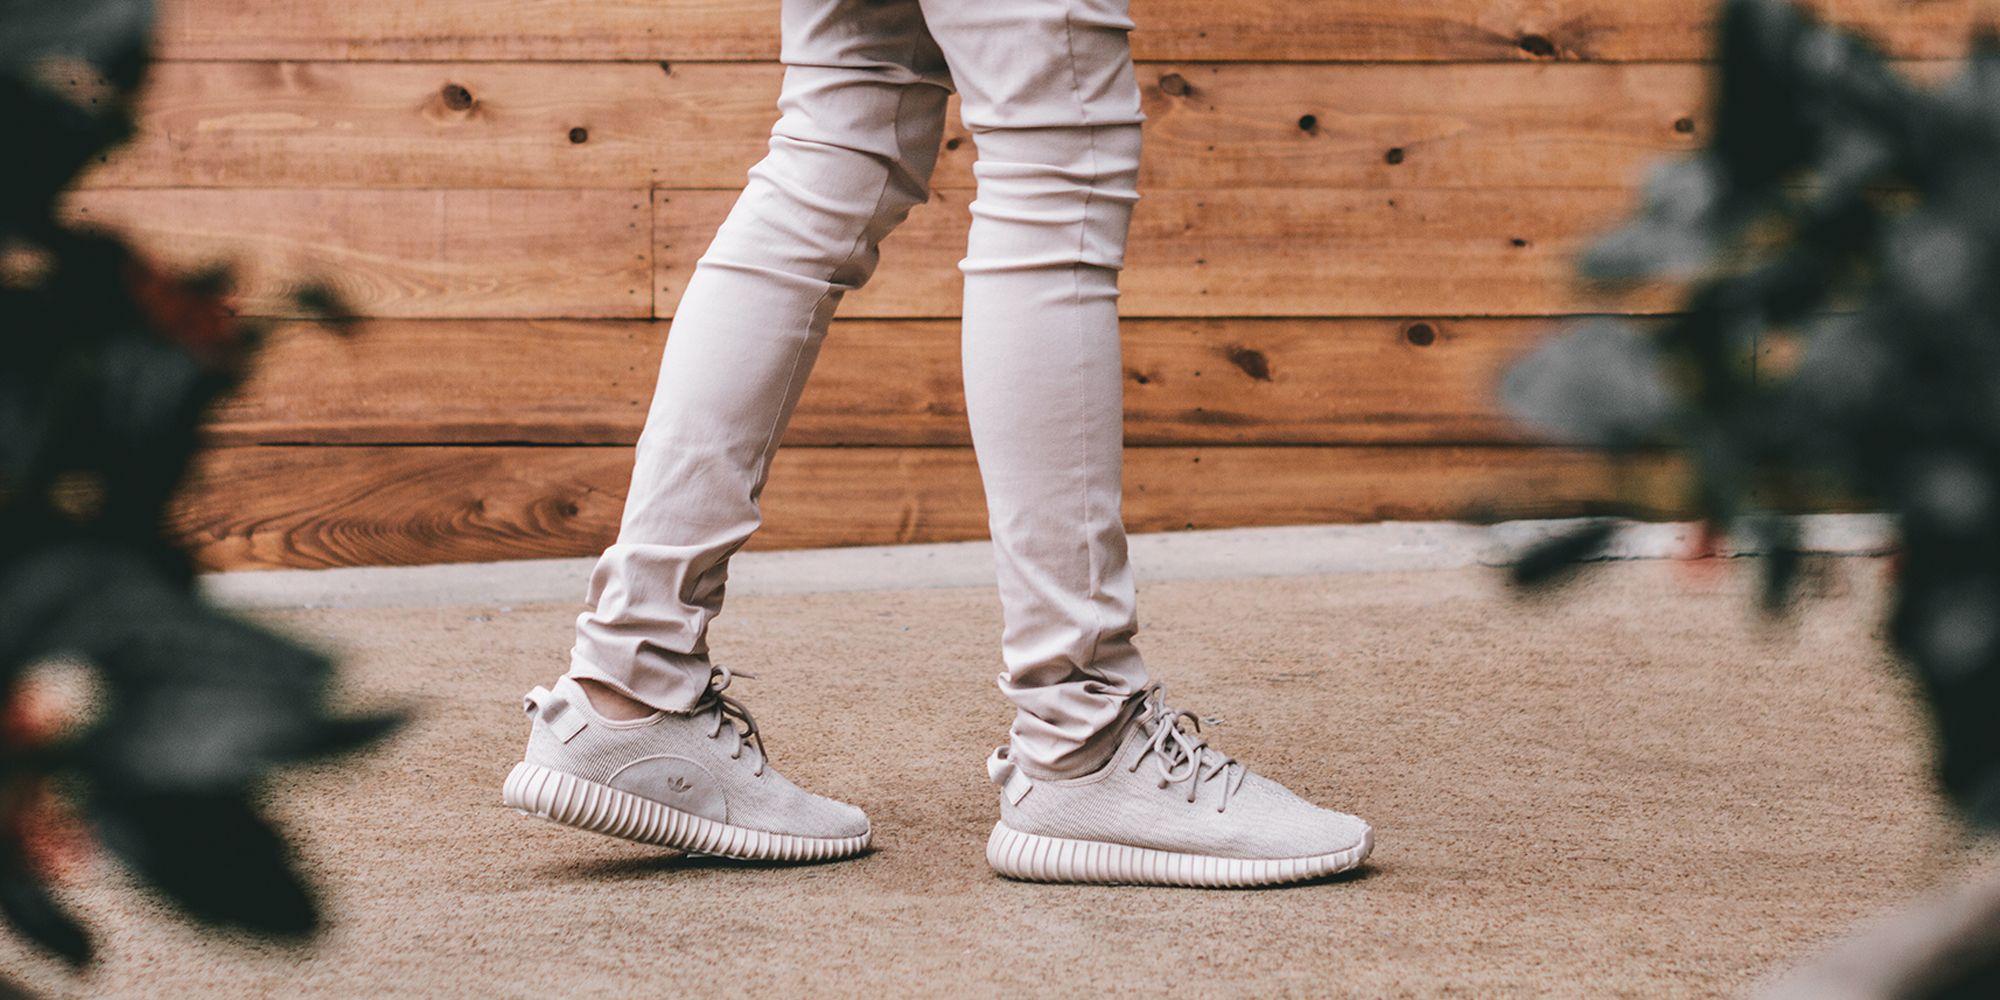 adidas Yeezy 350 Boost Oxford Tan Release Date | Yeezy